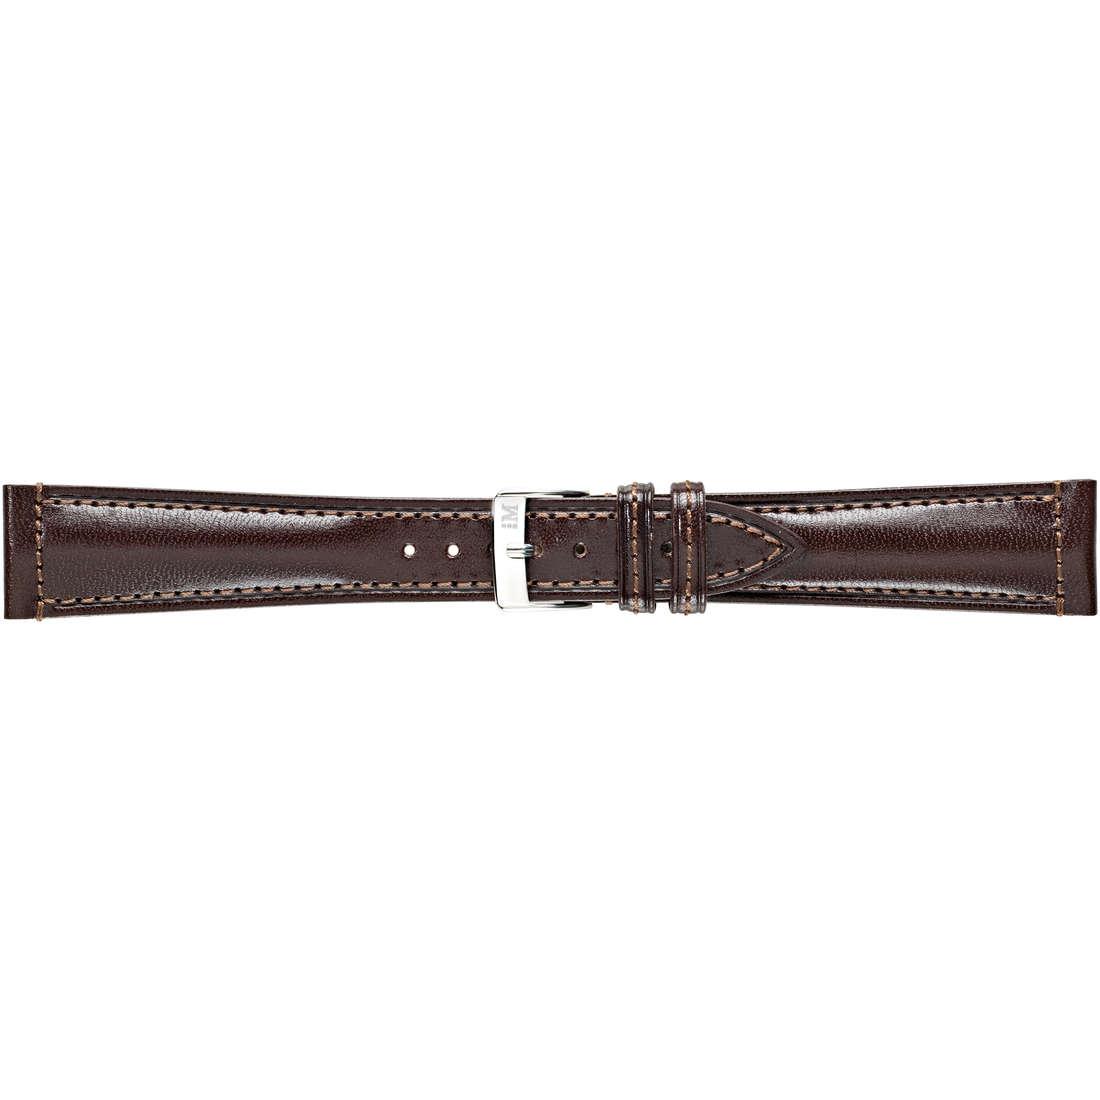 watch watch bands watch straps man Morellato Manufatti A01U0895403032CR16